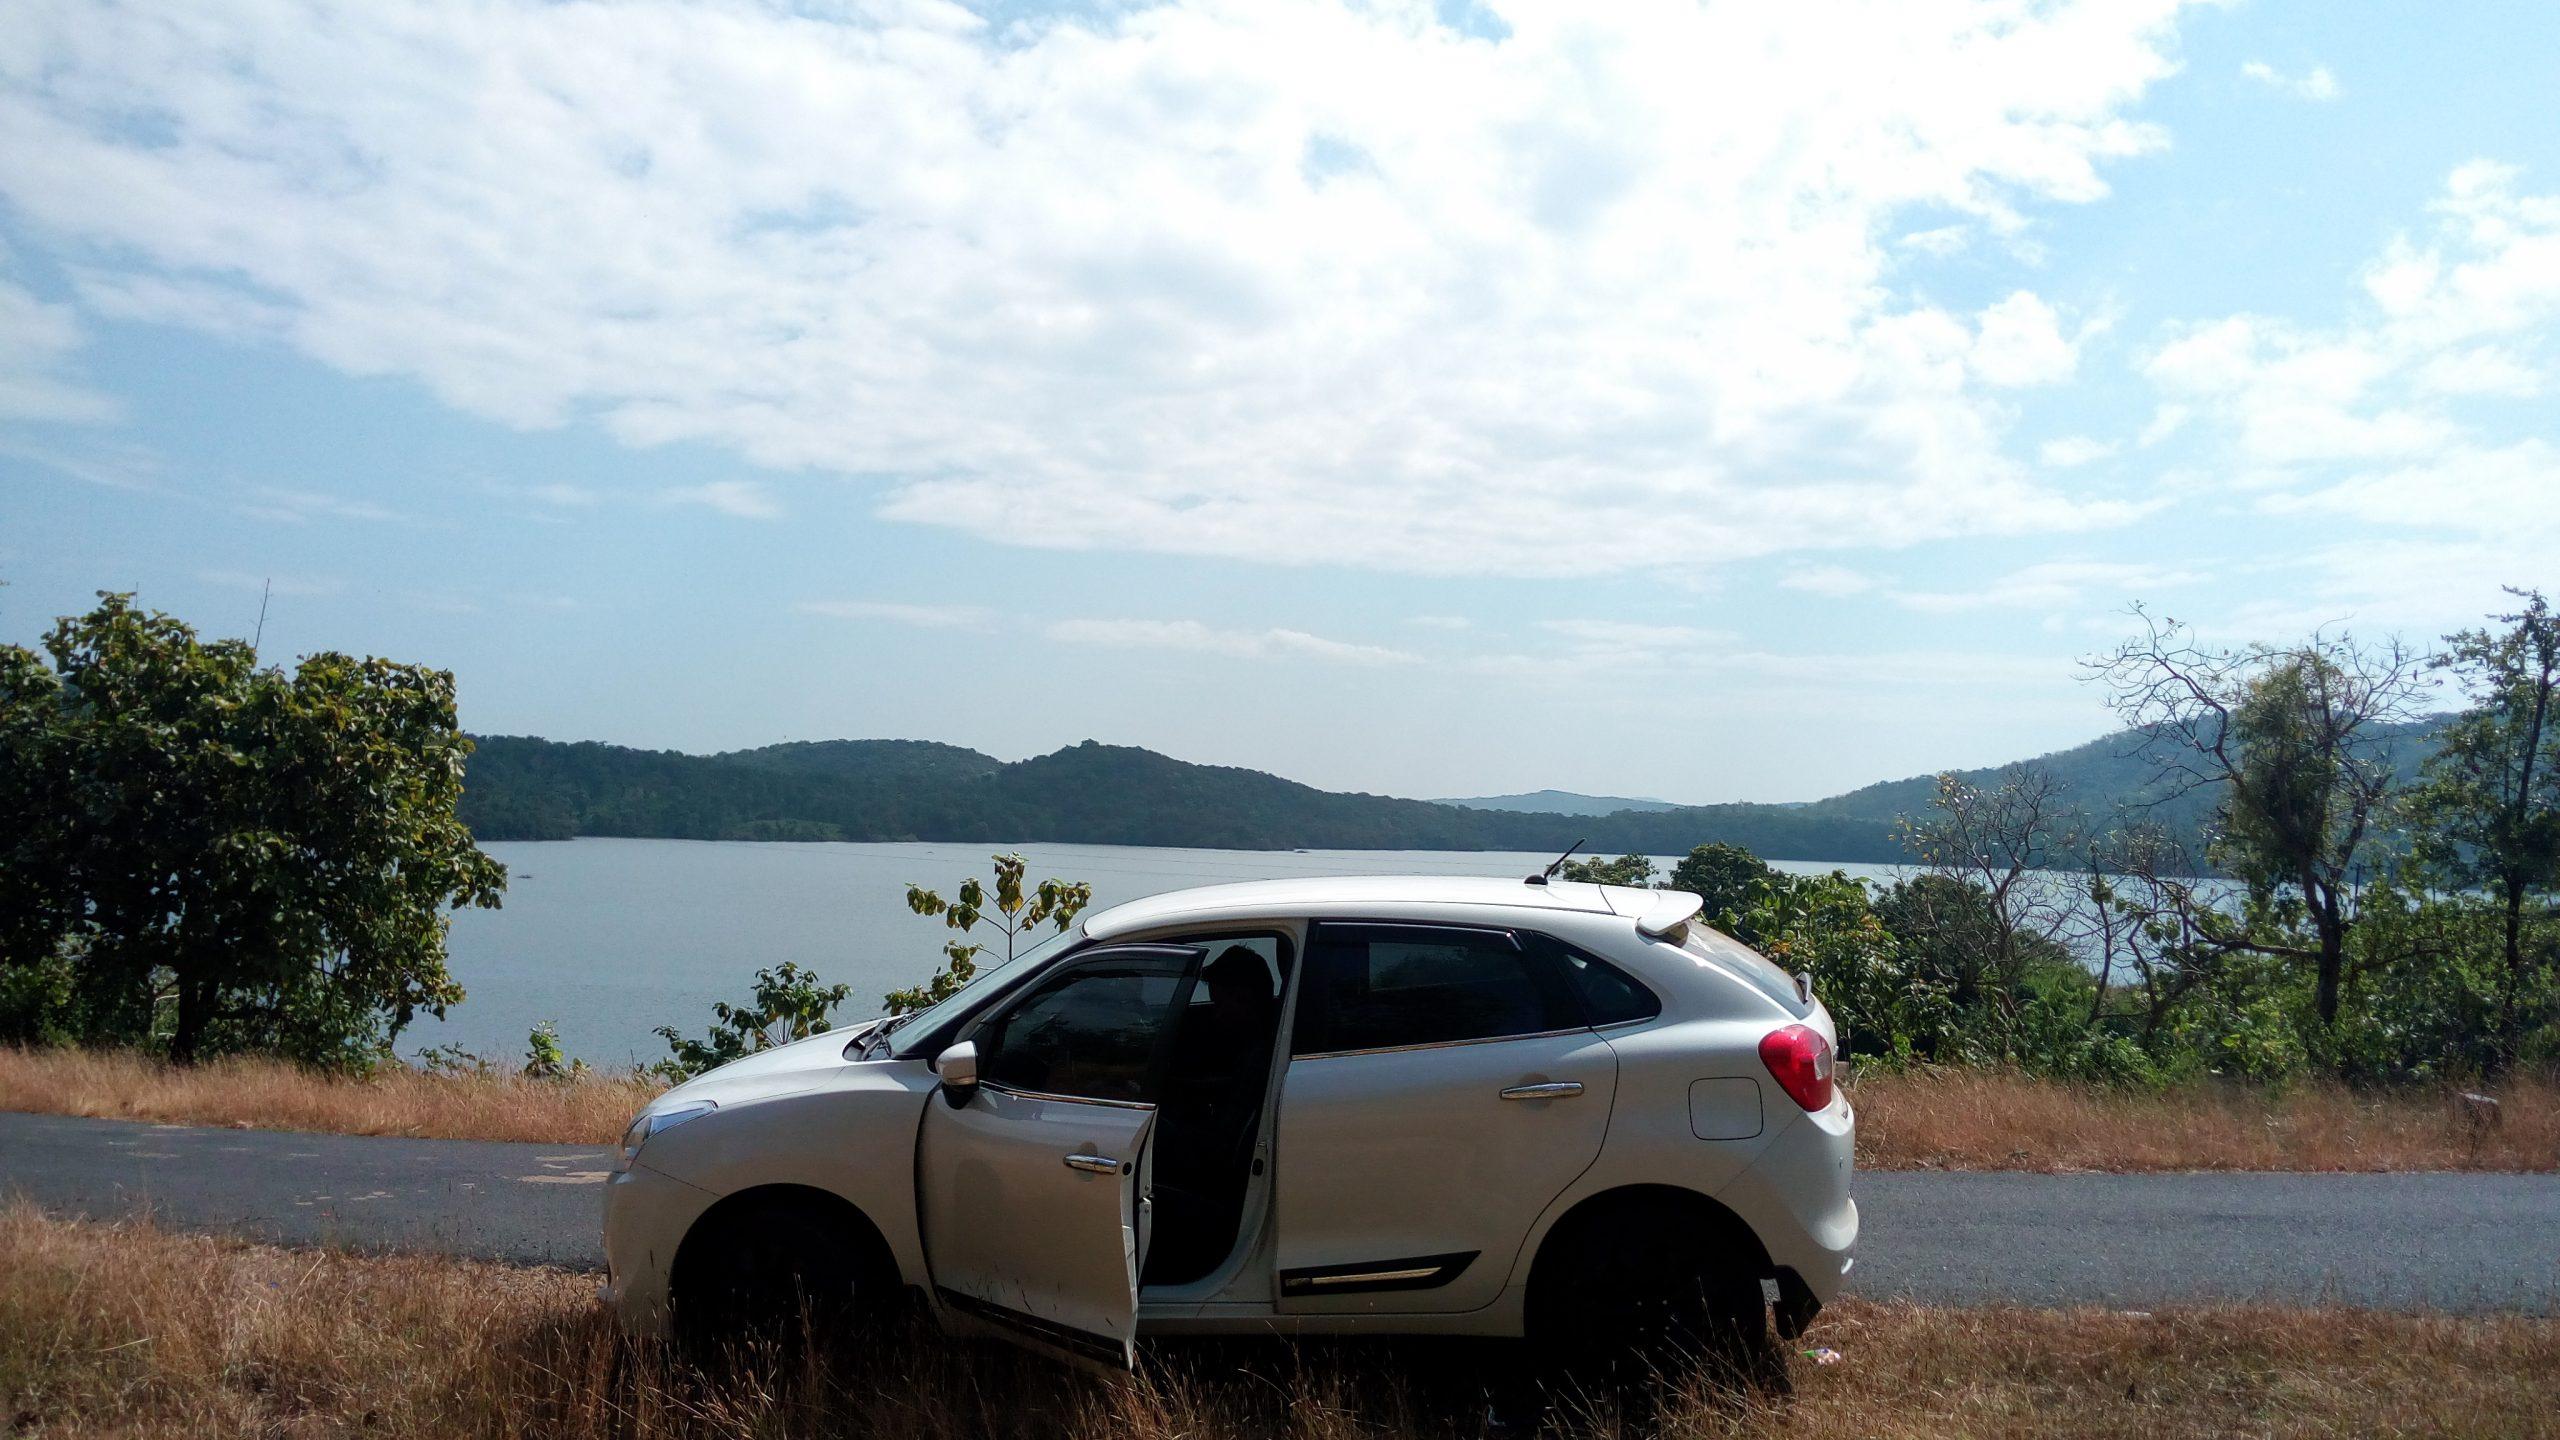 Car with an open door under the blue sky